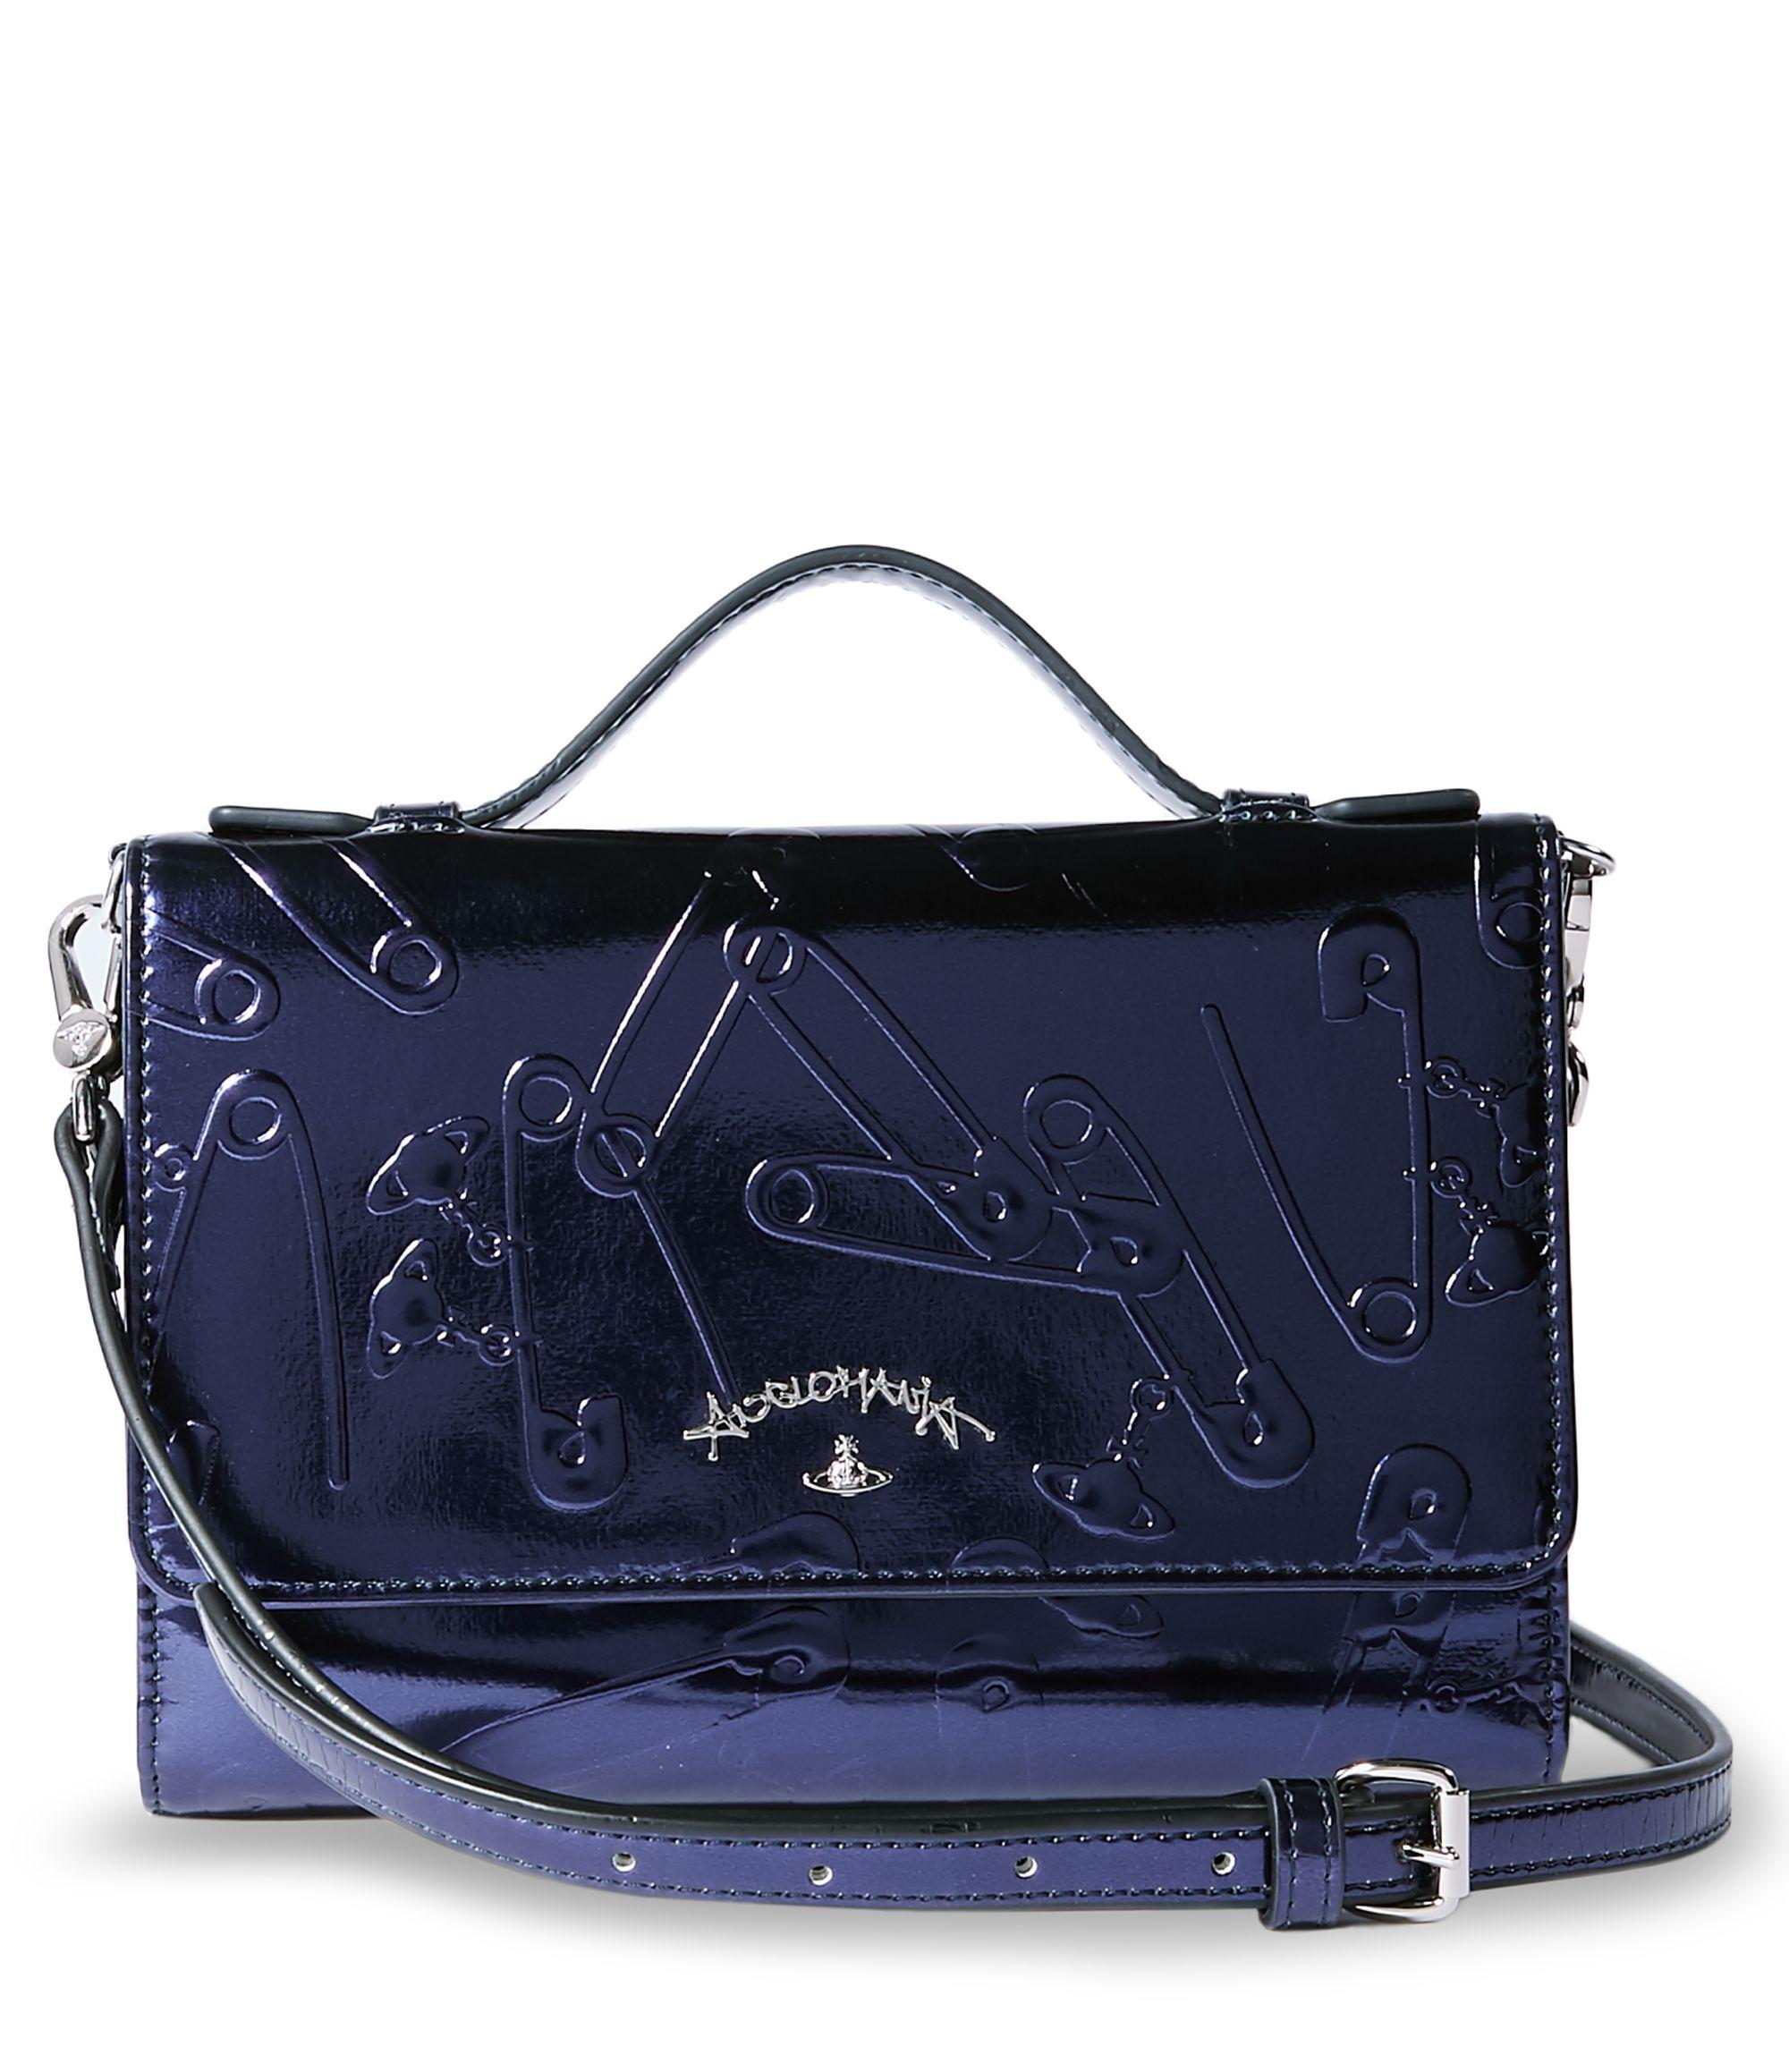 Blue Metal Safety Pin Travel Bag 321249 Vivienne Westwood